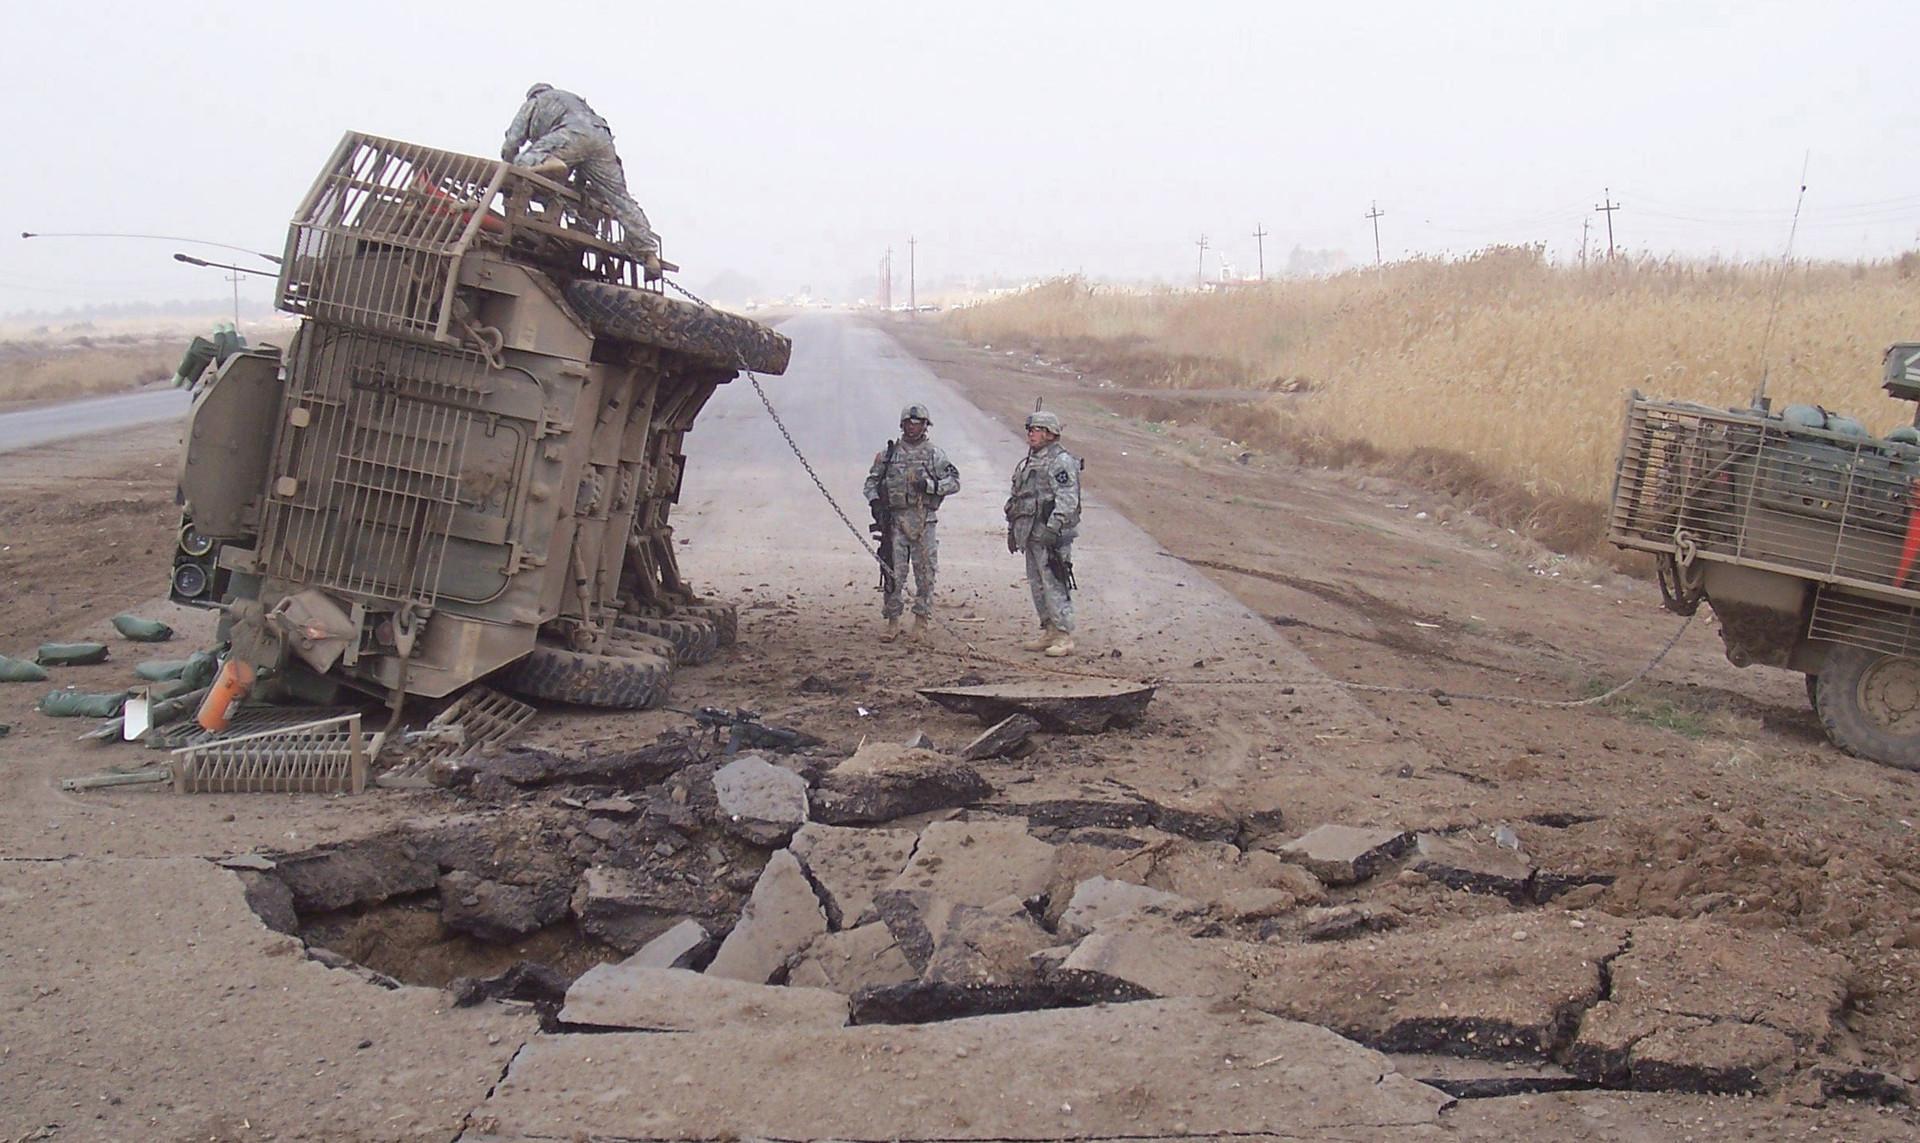 Prevrnjeni Stryker je zapeljal na improvizirano eksplozivno sredstvo, Irak 2007